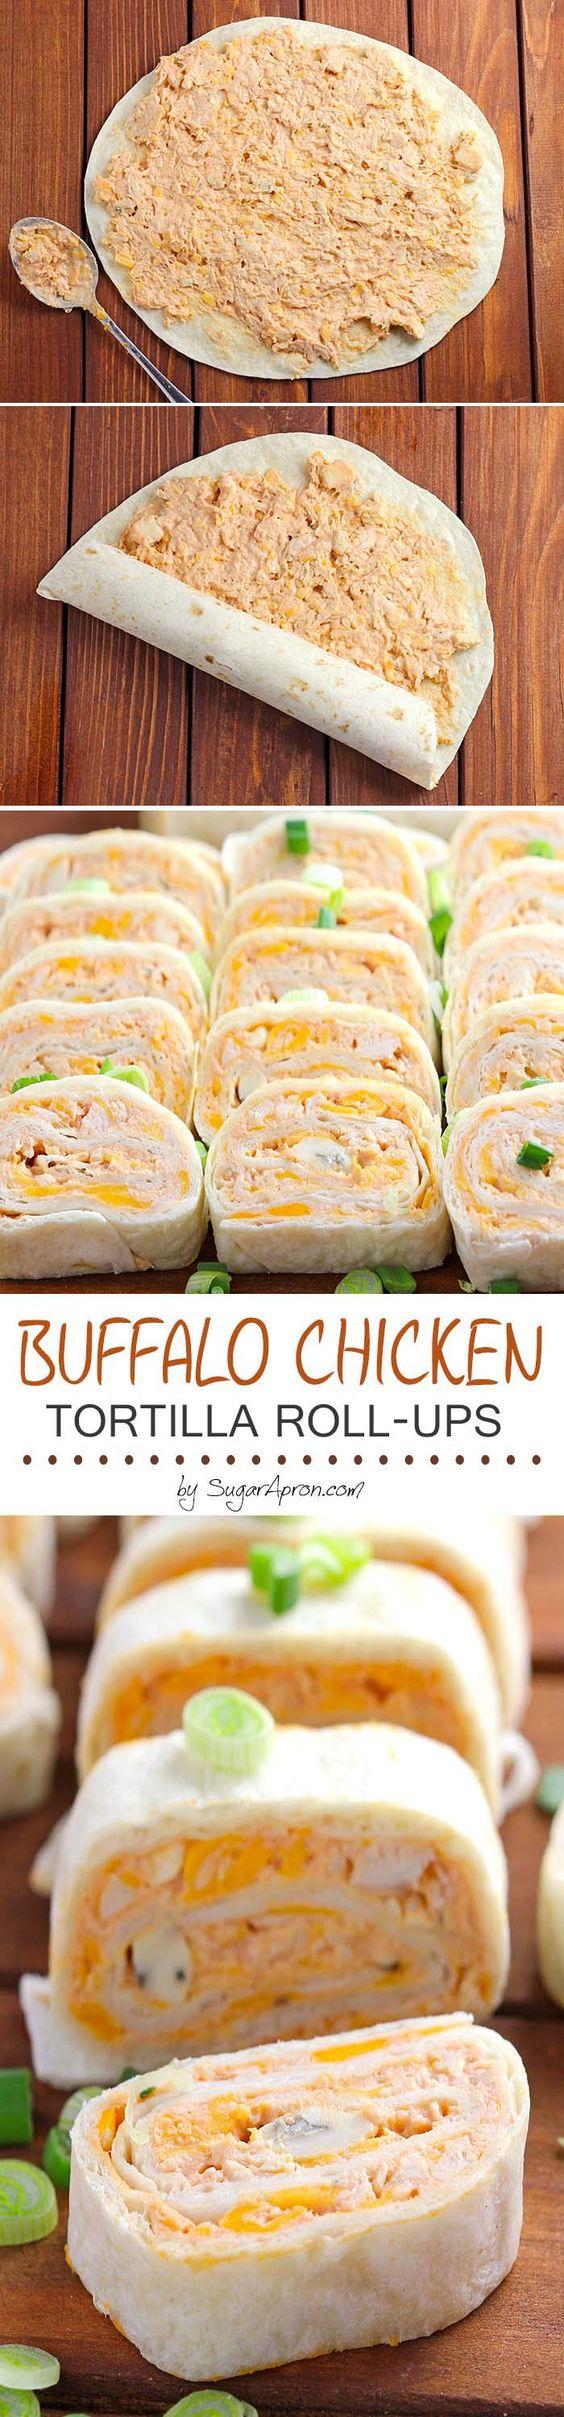 Buffalo Chicken Tortilla Roll Ups Buffalo Chicken Tortilla Roll Ups